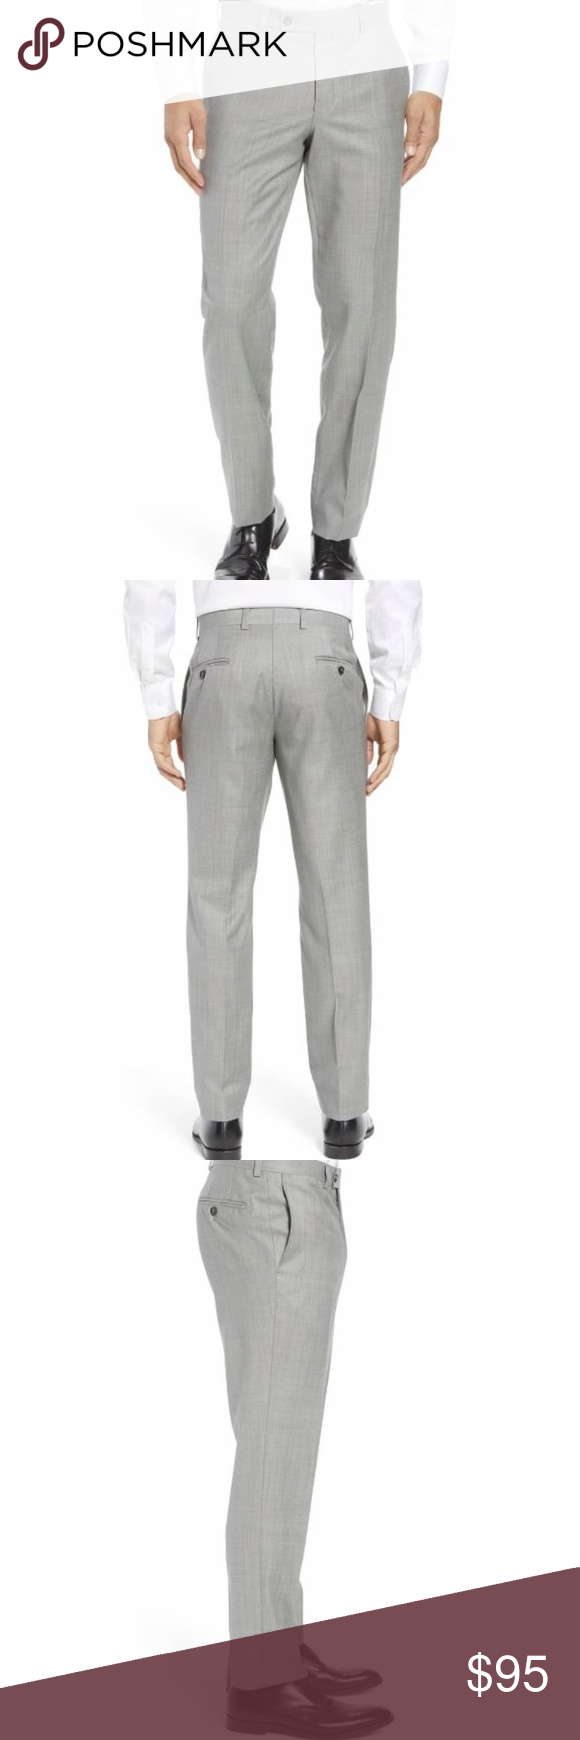 61e0e4447 TED BAKER Jefferson Flat Front Wool Trousers NWT TED BAKER LONDON Mens 36R Jefferson  Flat Front